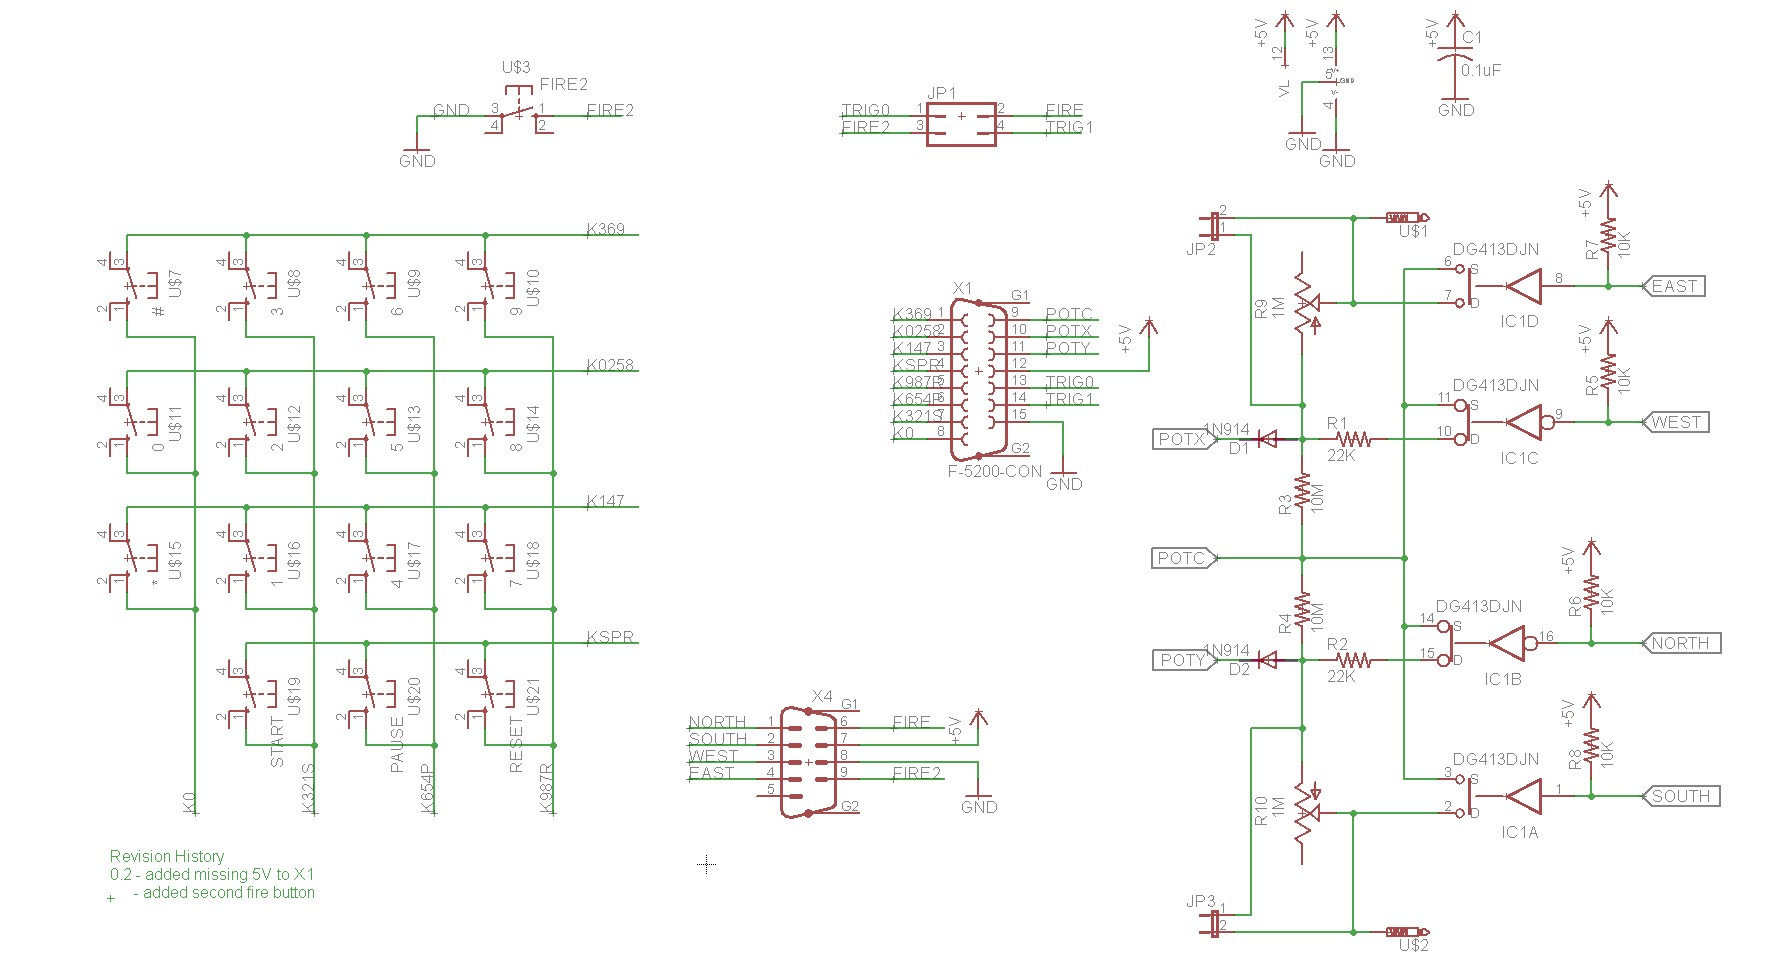 Ge Dpxr473gwoww Dryer Wiring Diagrams Online. . Wiring Diagram on